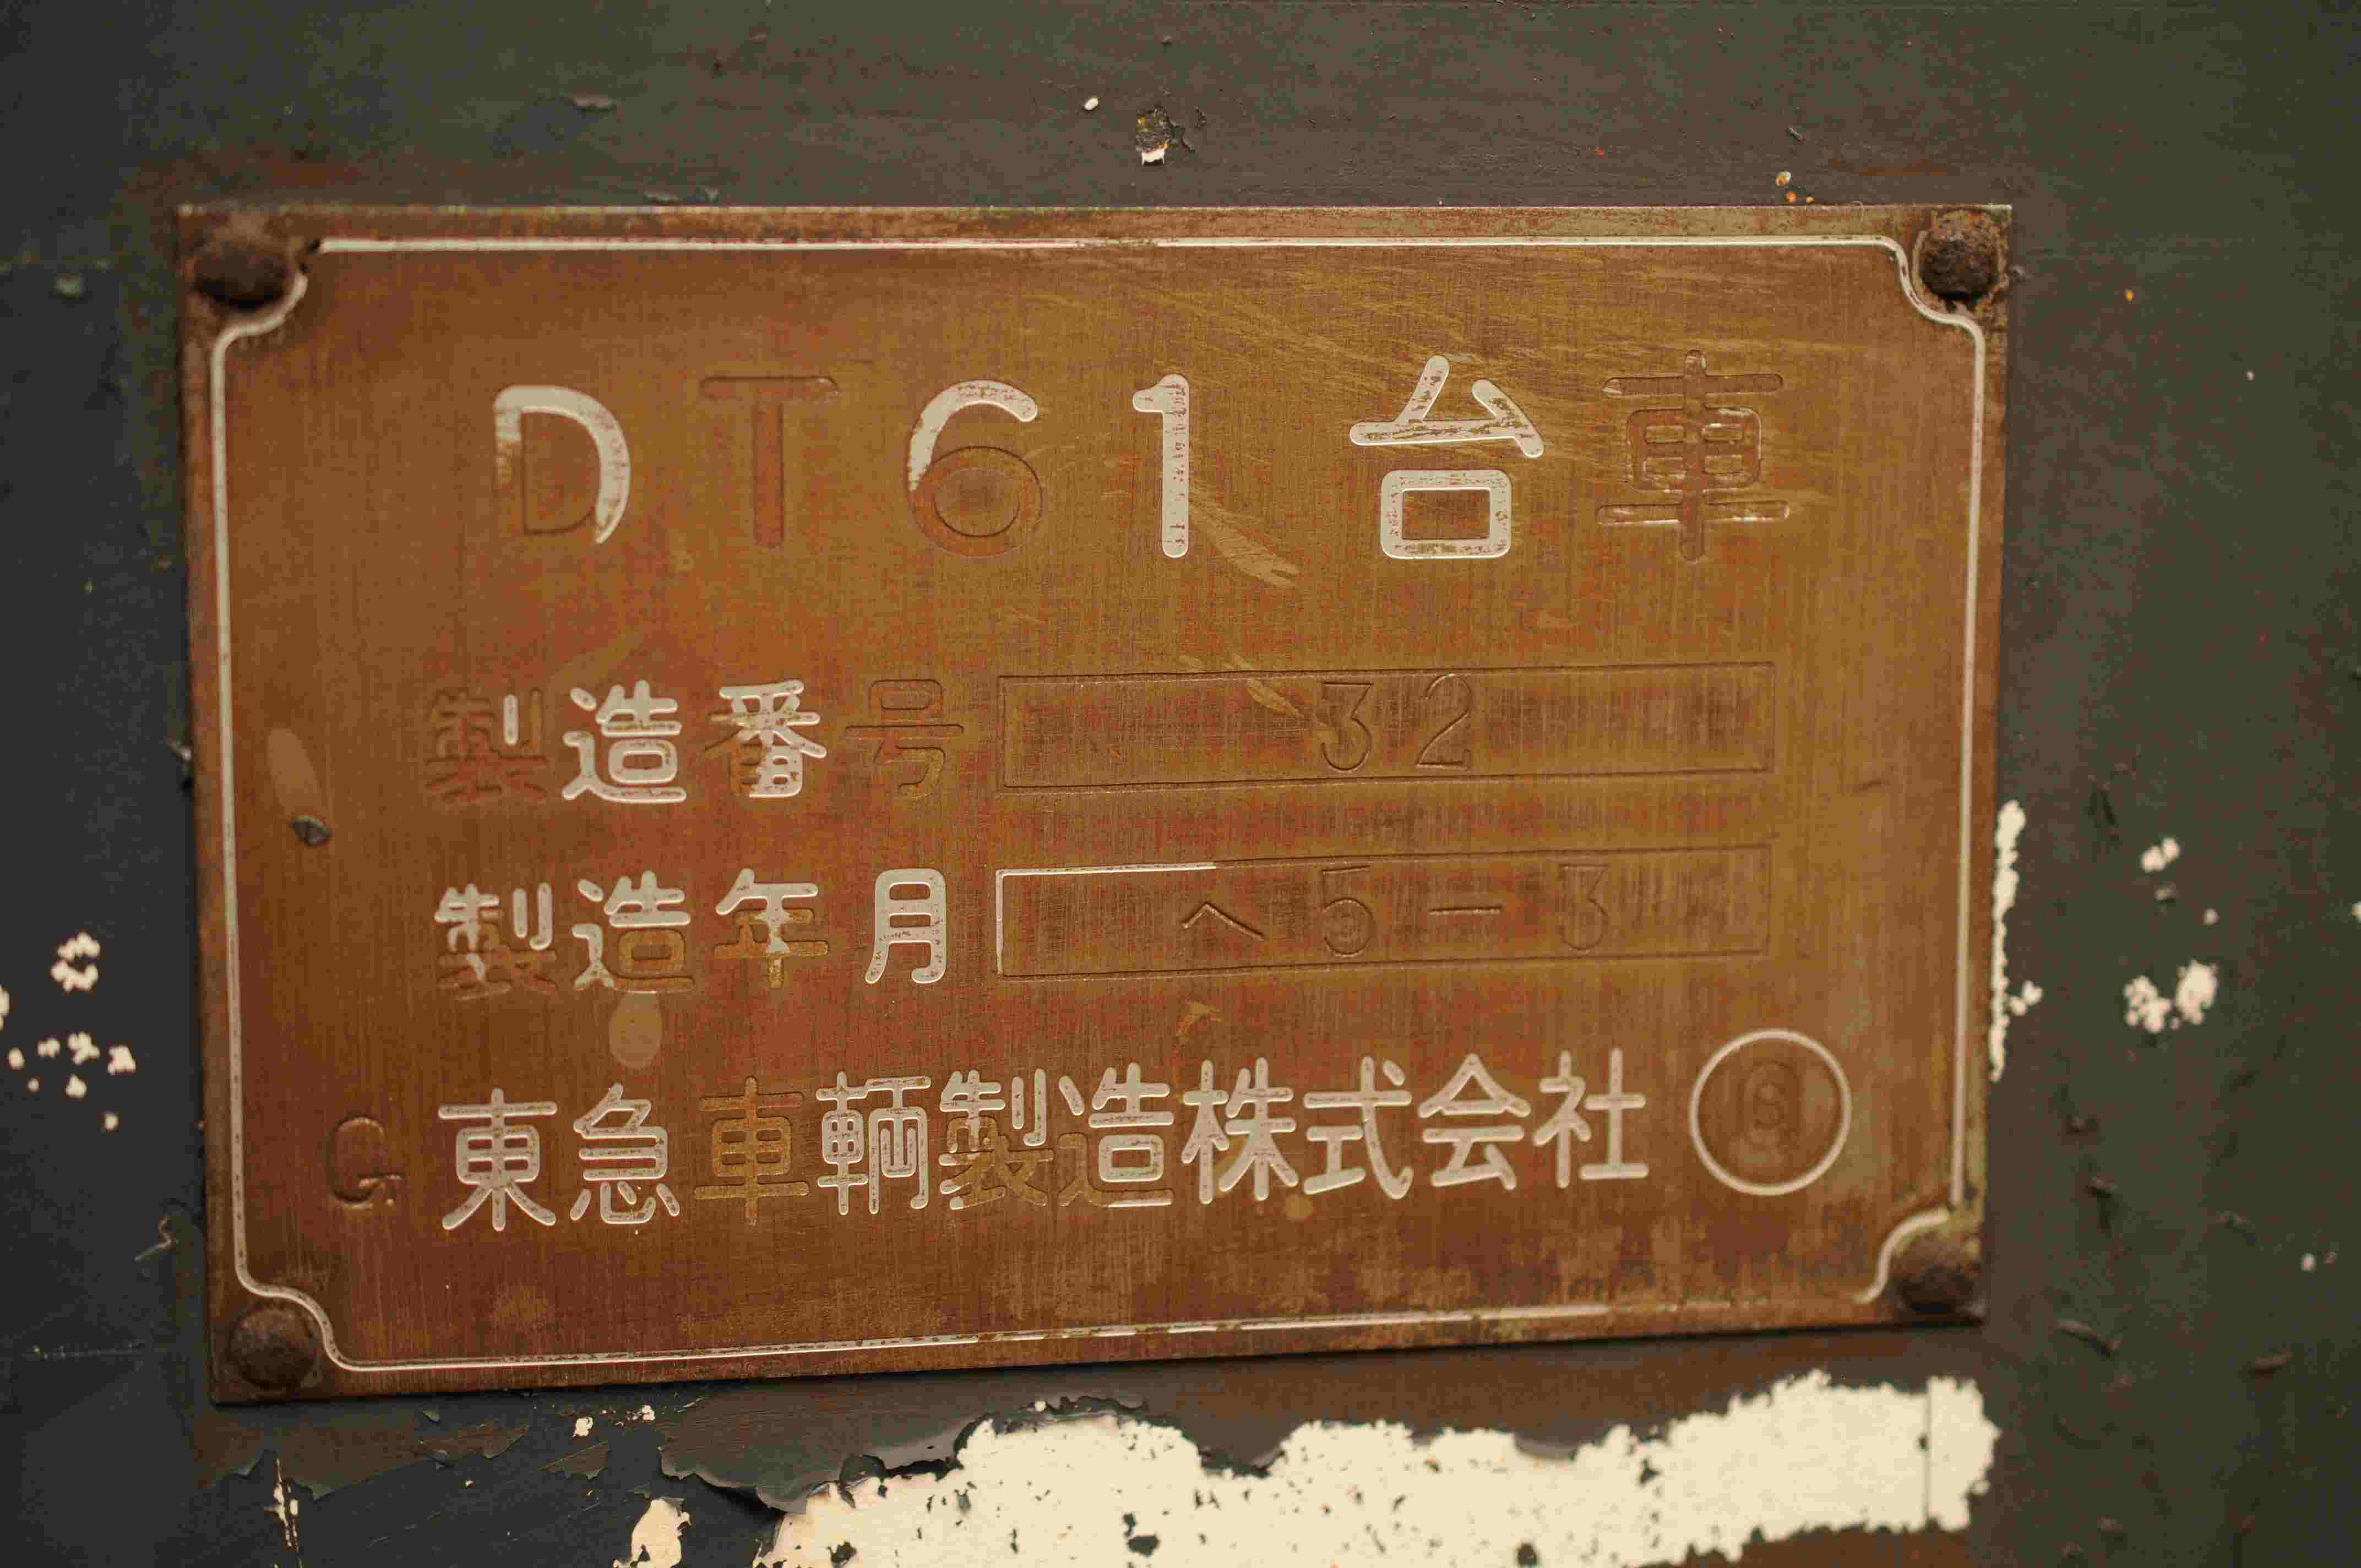 DSC_9667-1.jpg